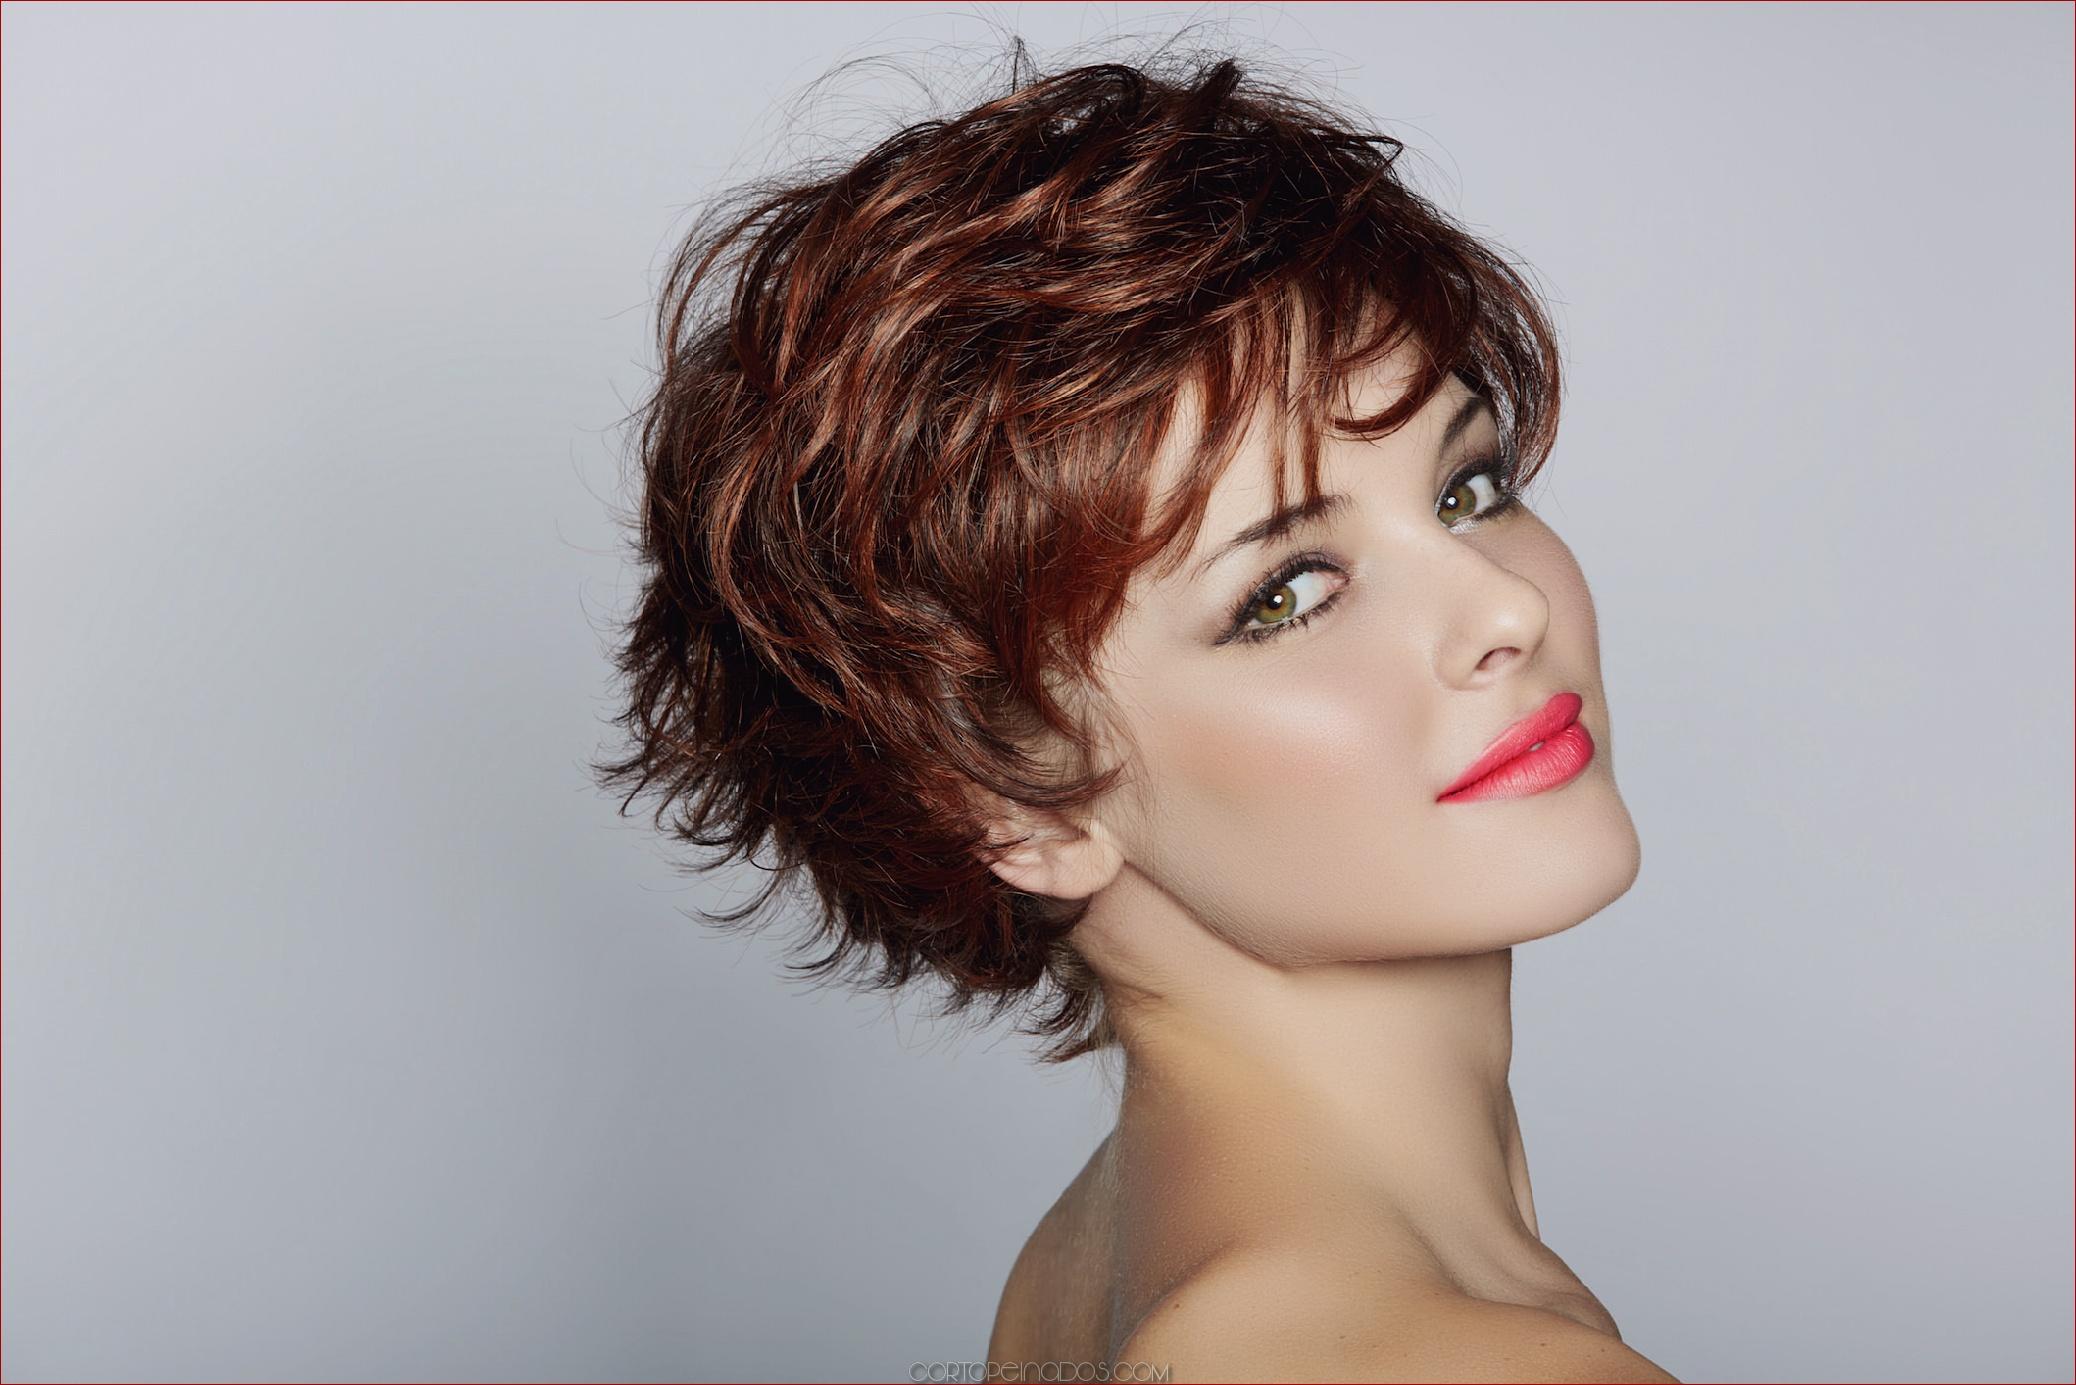 5 Model Rambut Rambut Pendek Wanita Yang Tambah Bikin Kamu Semakin Percaya Diri 7